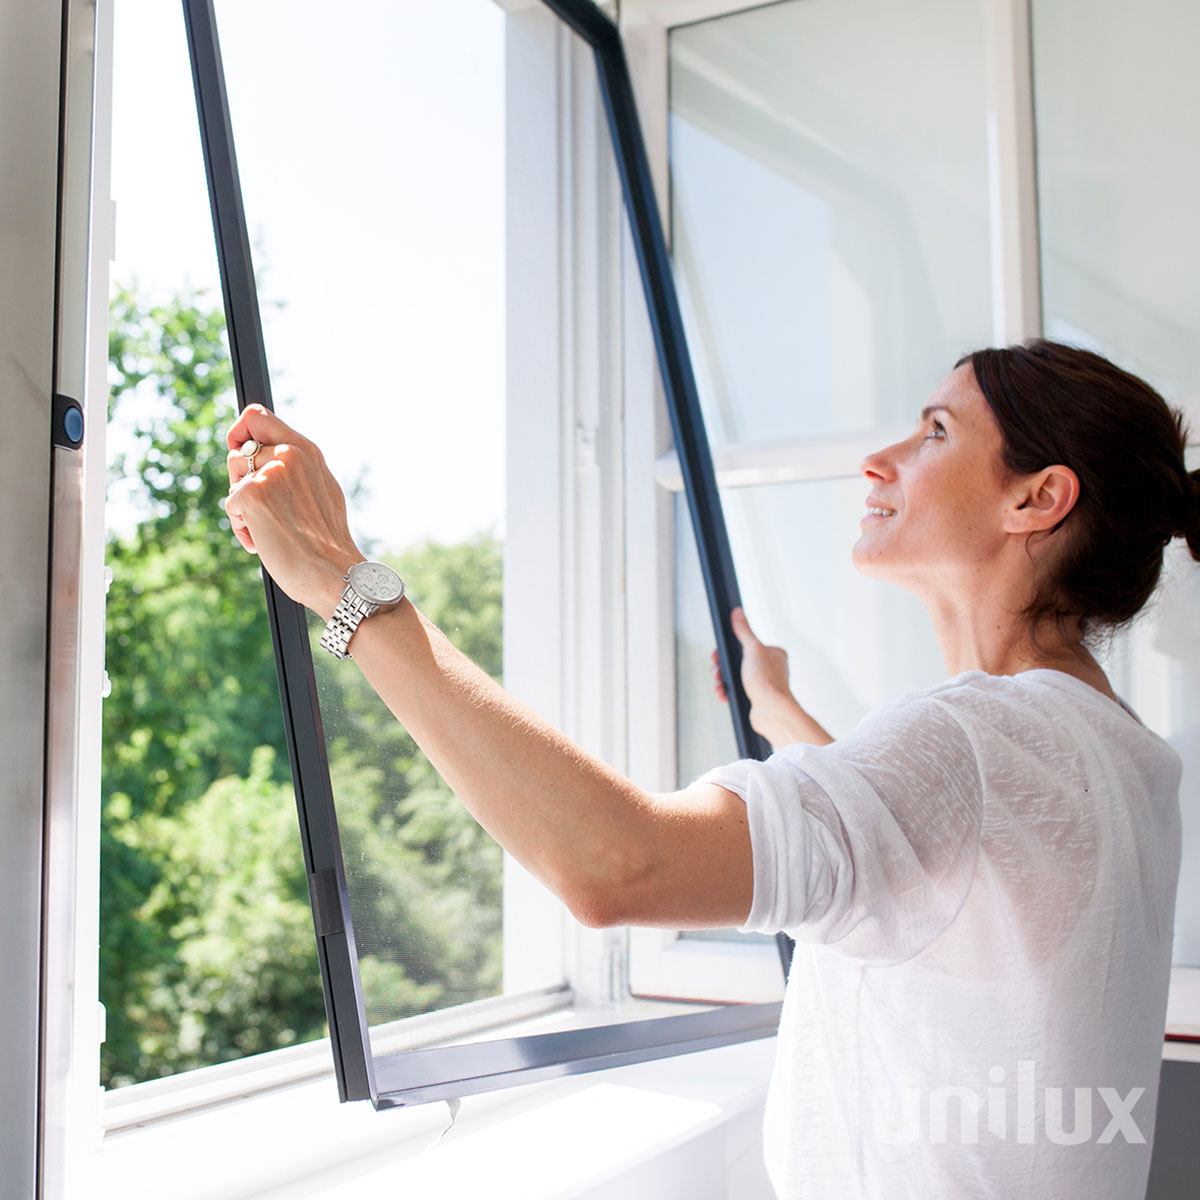 Unilux - Inklemhor - Groenevelt Zonwering & Raamdecoratie